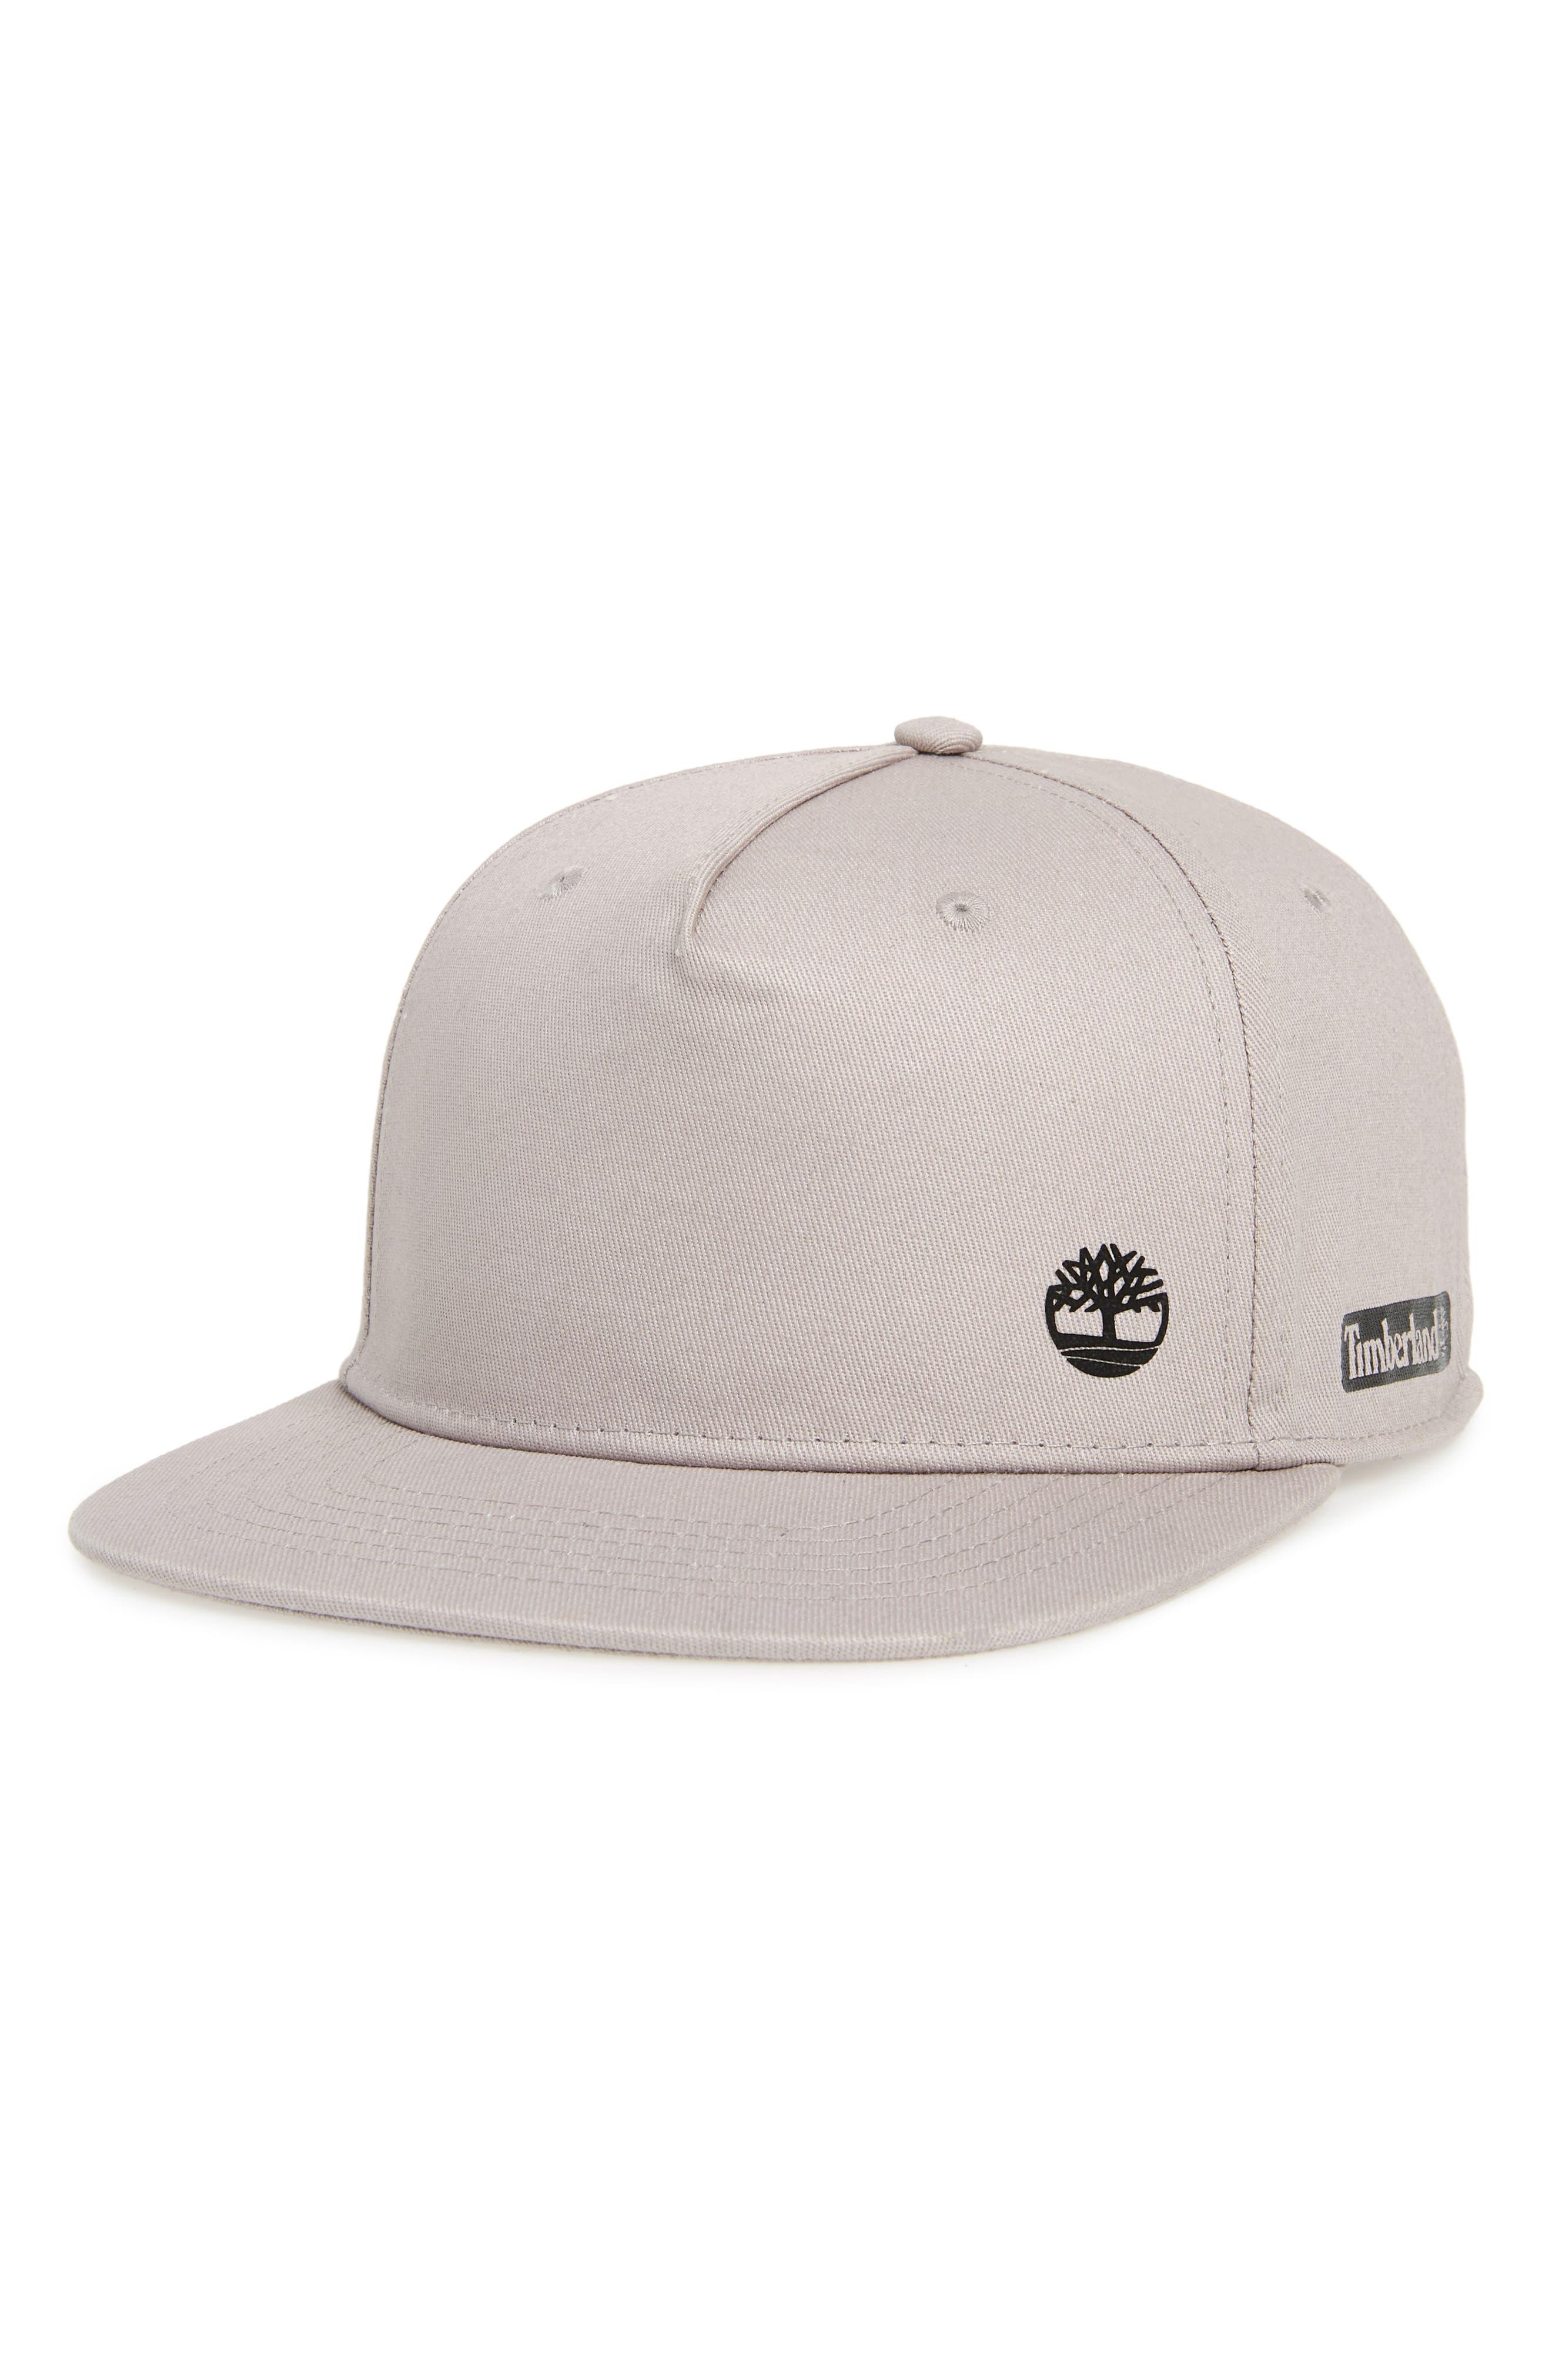 Castle Hill Baseball Cap,                             Main thumbnail 1, color,                             Light Grey